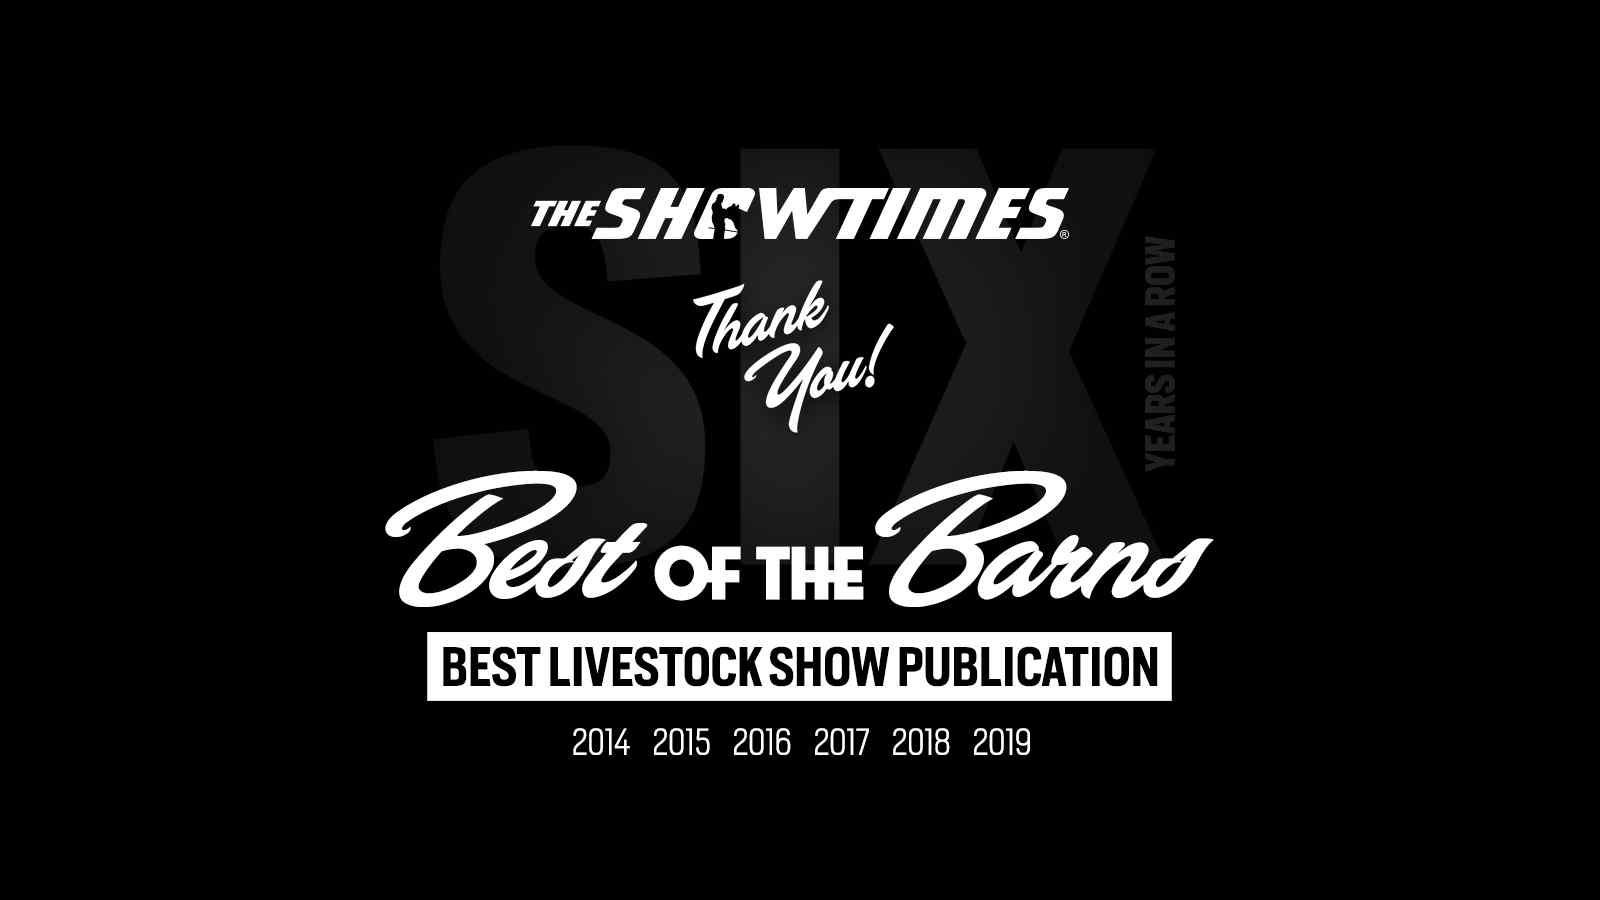 BEST LIVESTOCK PUBLICATION!